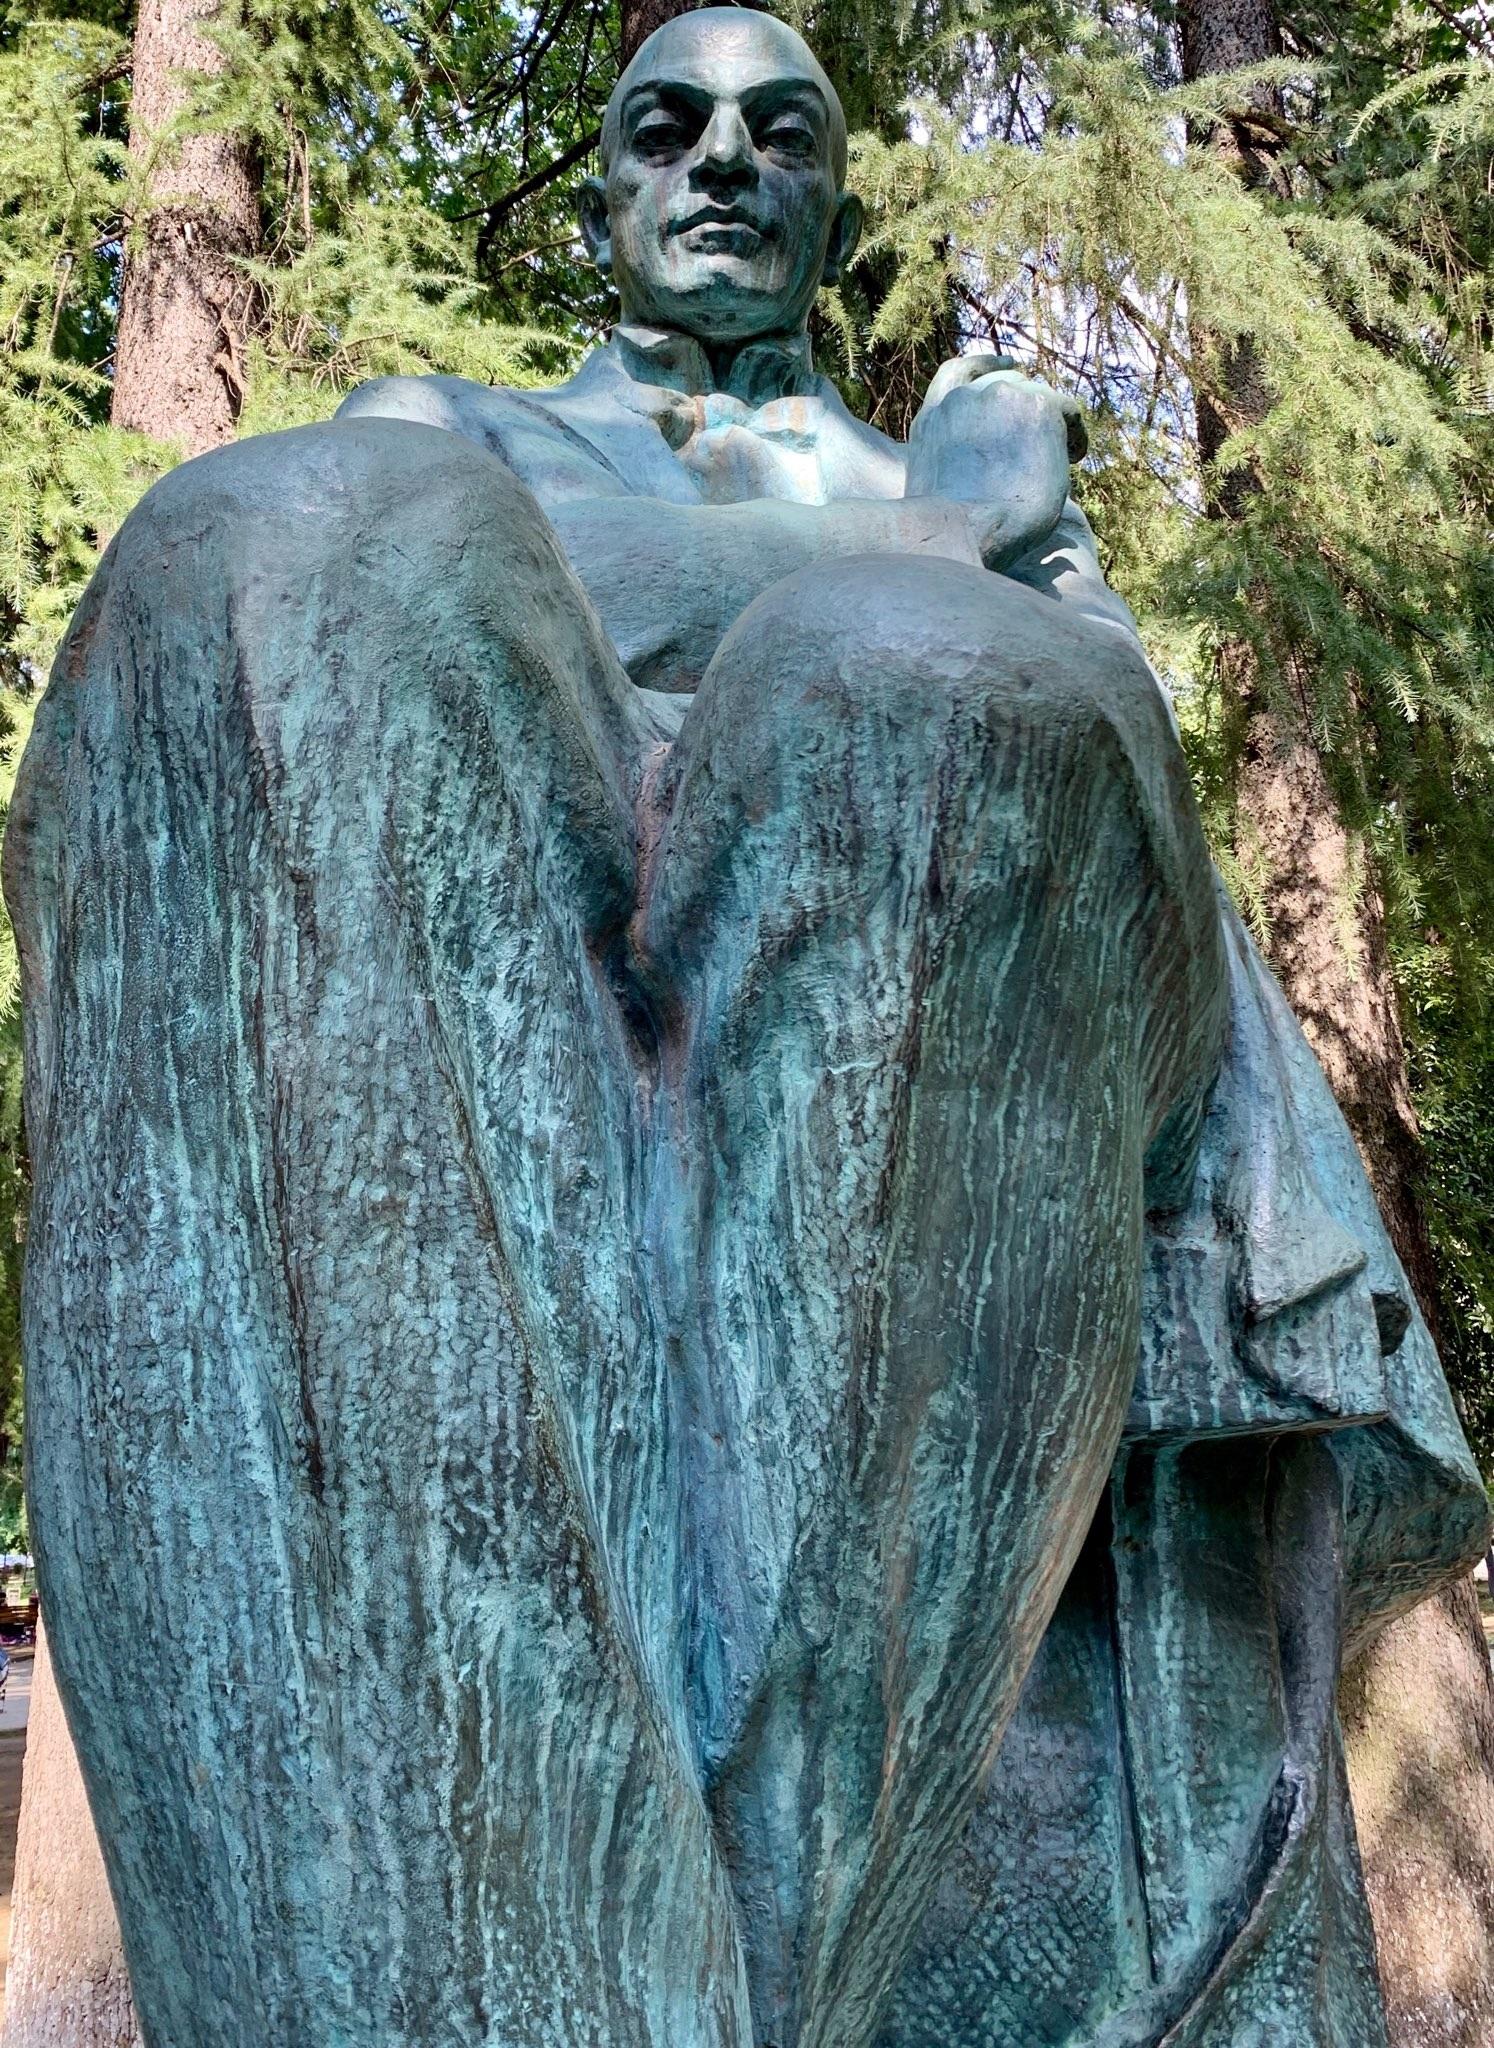 Eaj0OWxWoAI_RWs writer's statue in kutaisi georgia